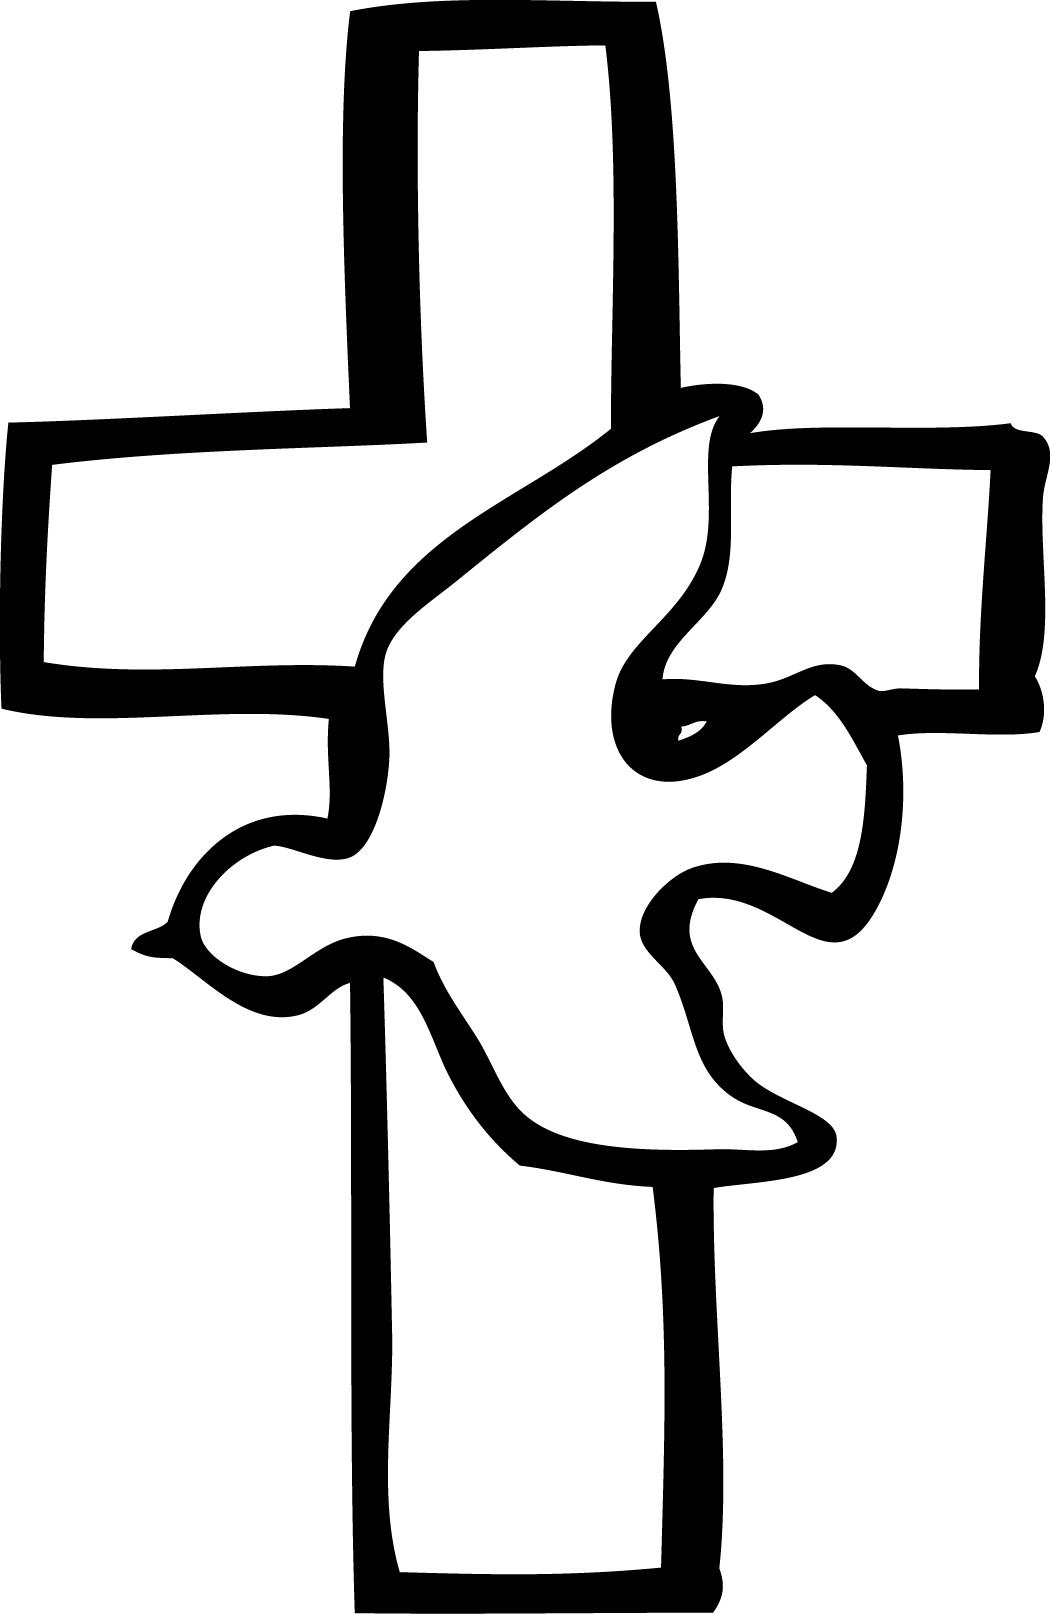 Catholic symbols clipart clip art freeuse Free Catholic Cliparts, Download Free Clip Art, Free Clip Art on ... clip art freeuse